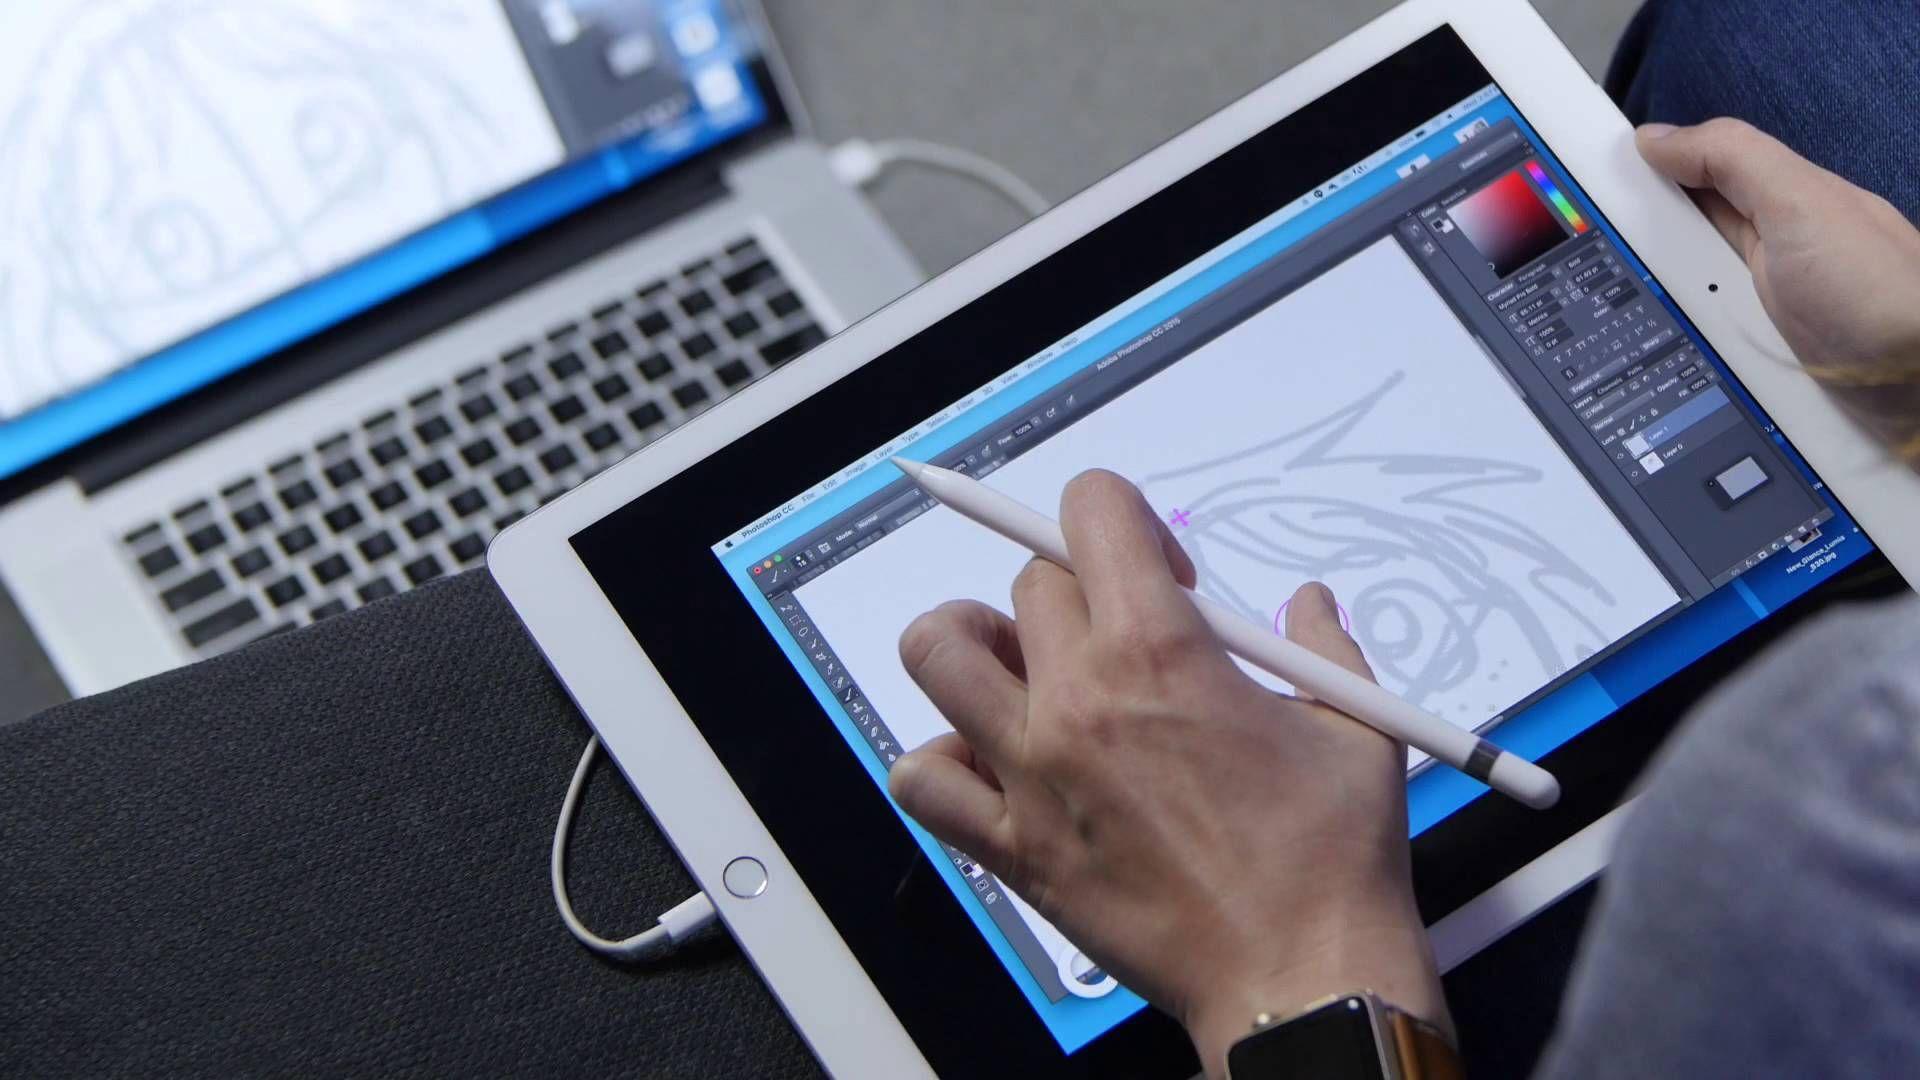 Can I Put Photoshop on My iPad? | It Still Works